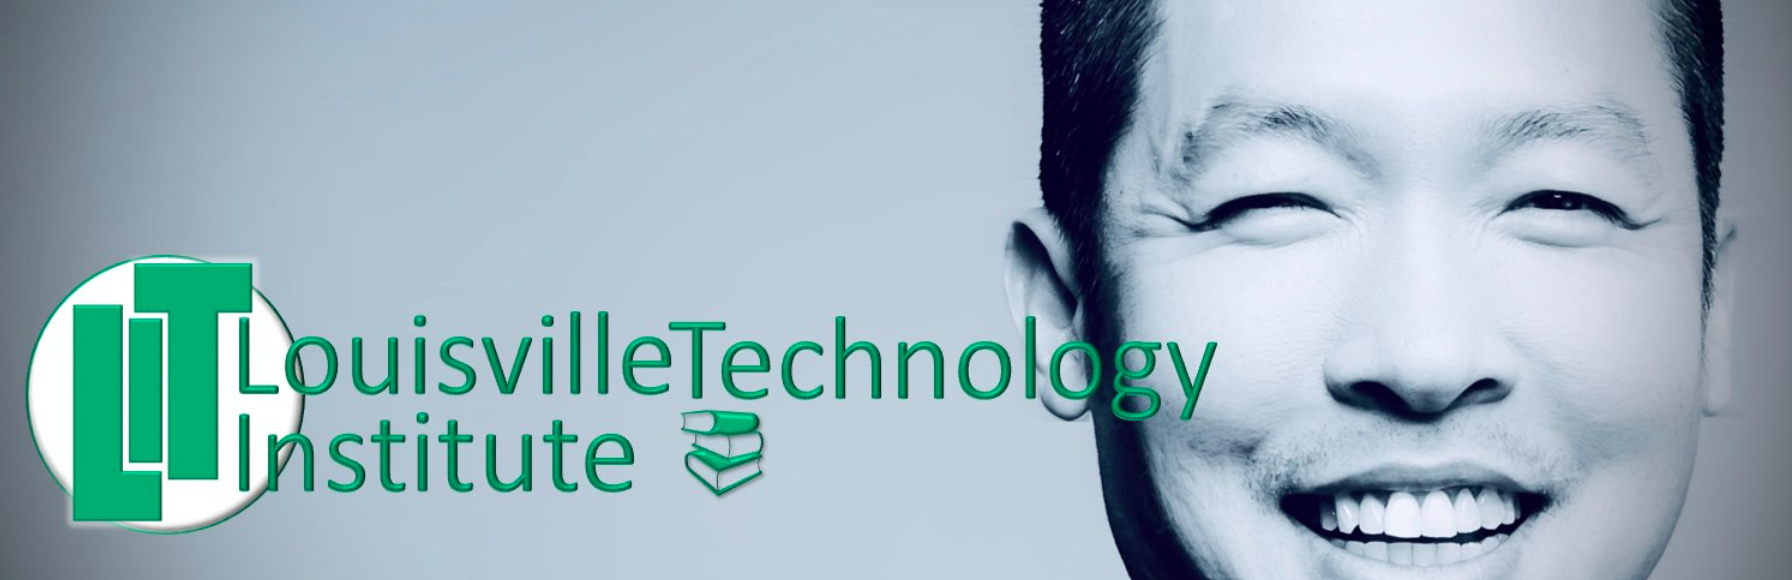 We Are LIT (Louisville Institute Technology) – Louisville, KY